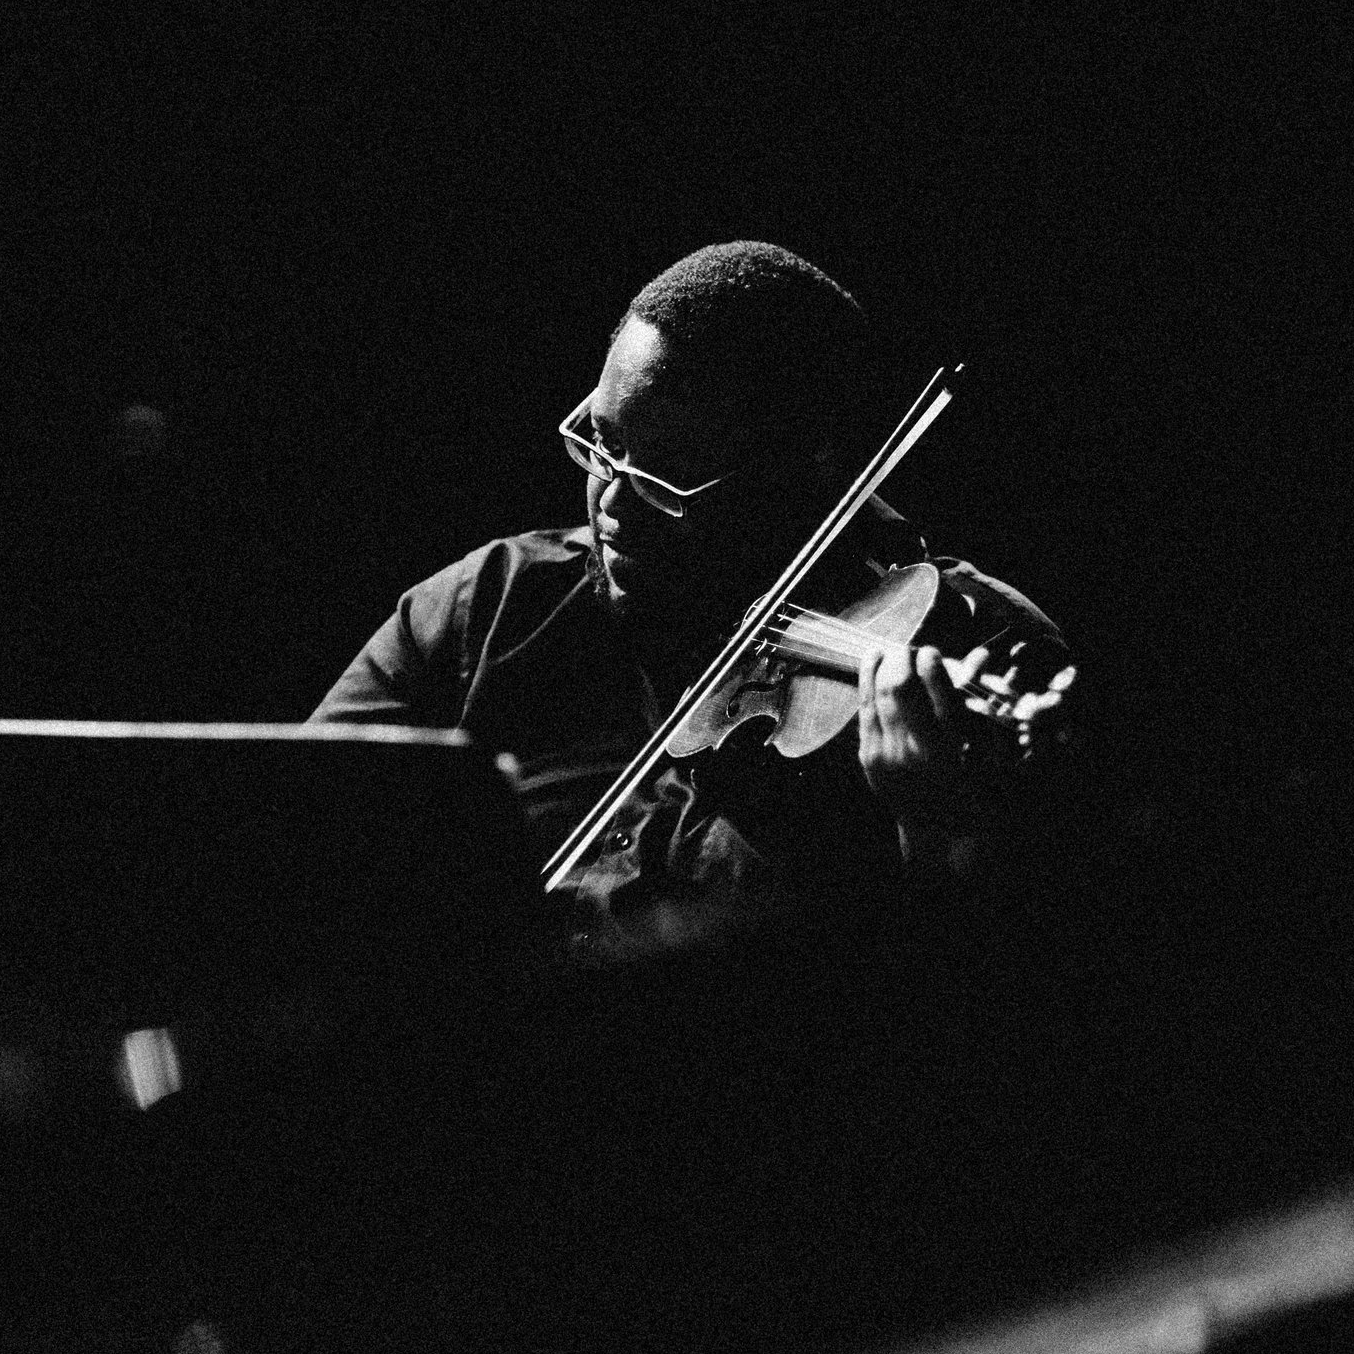 Kevin Chaney, Violin